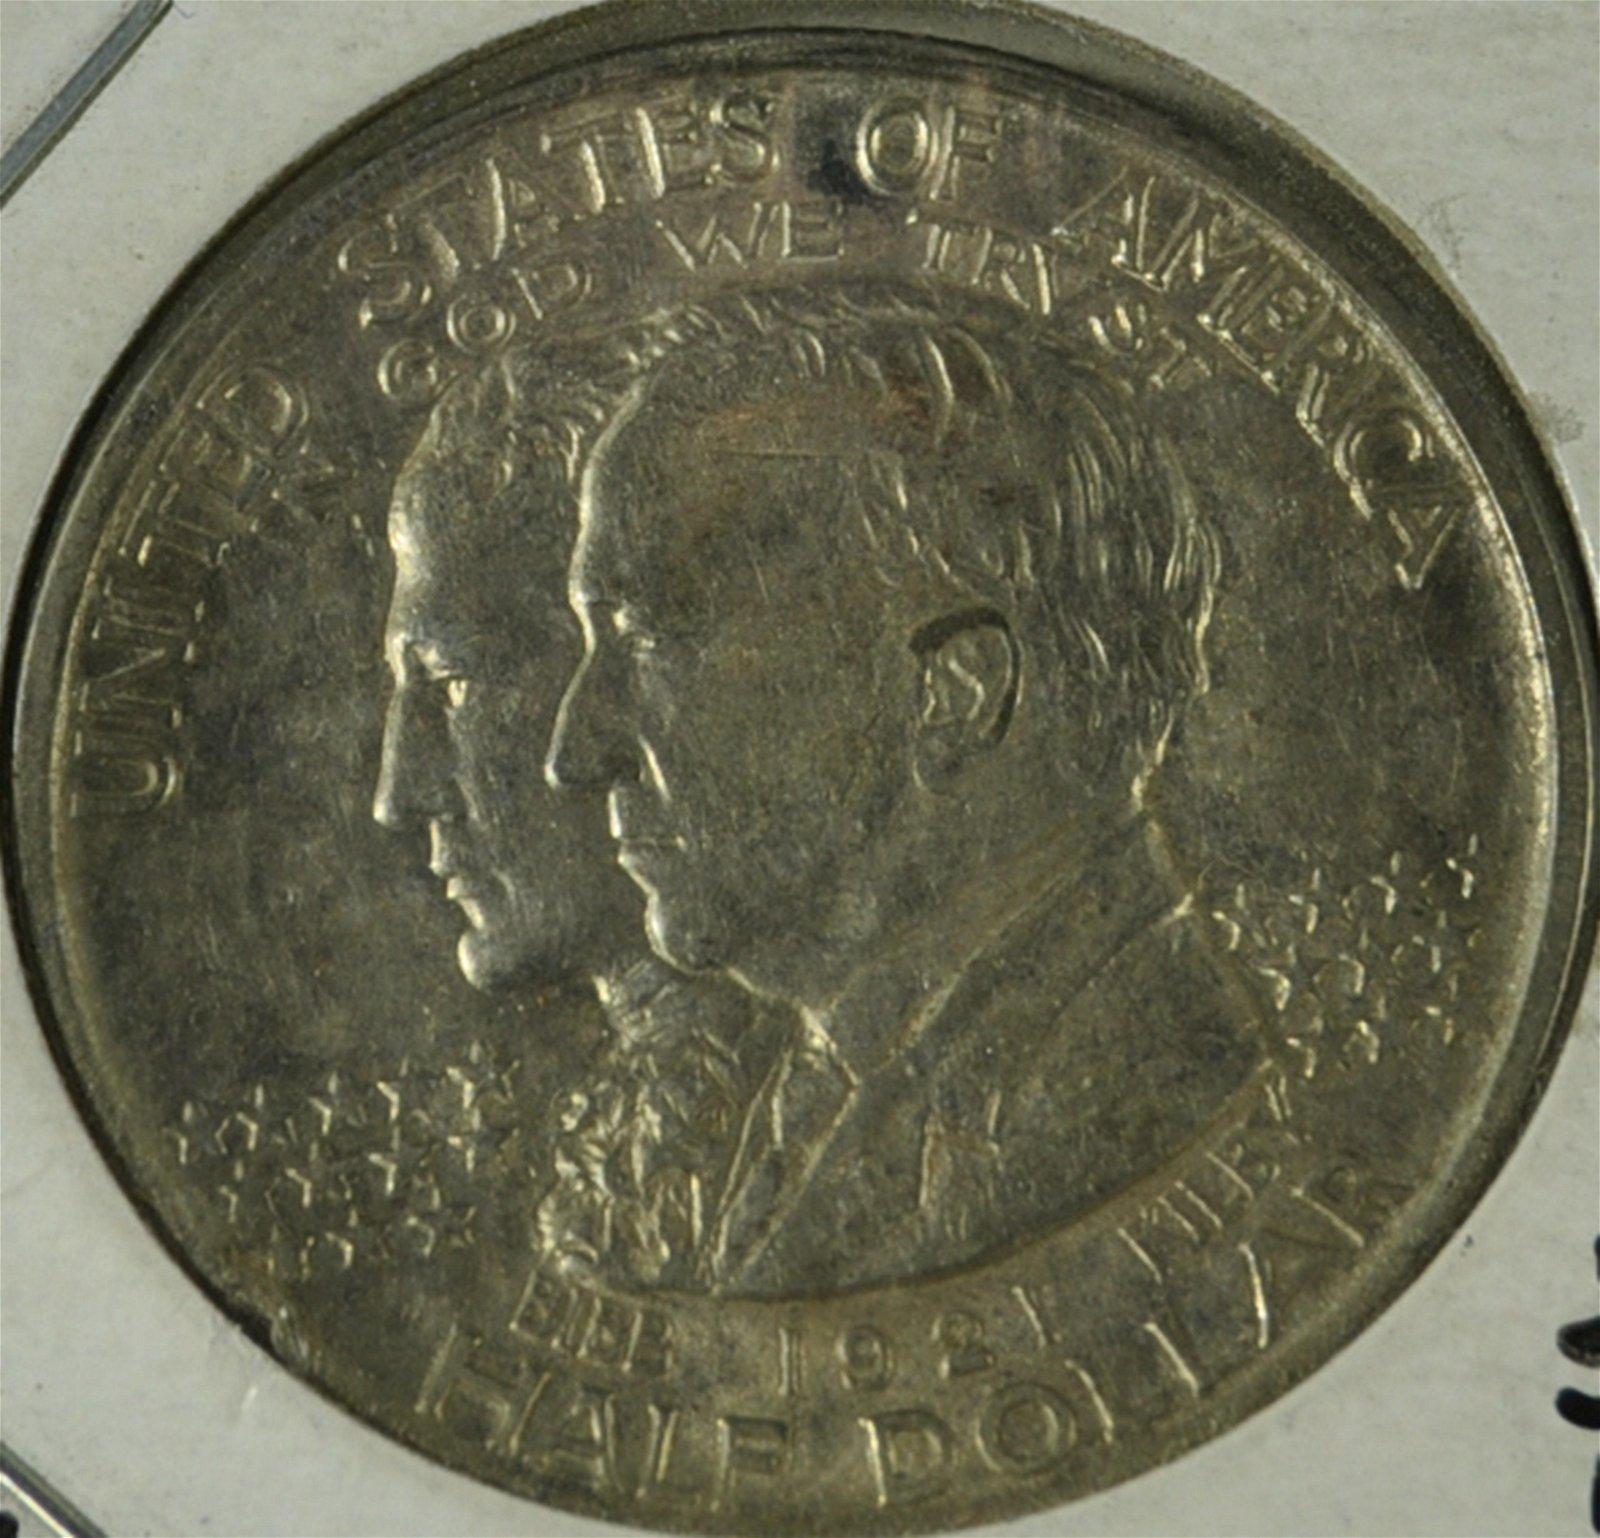 1921 Alabama Centennial Half